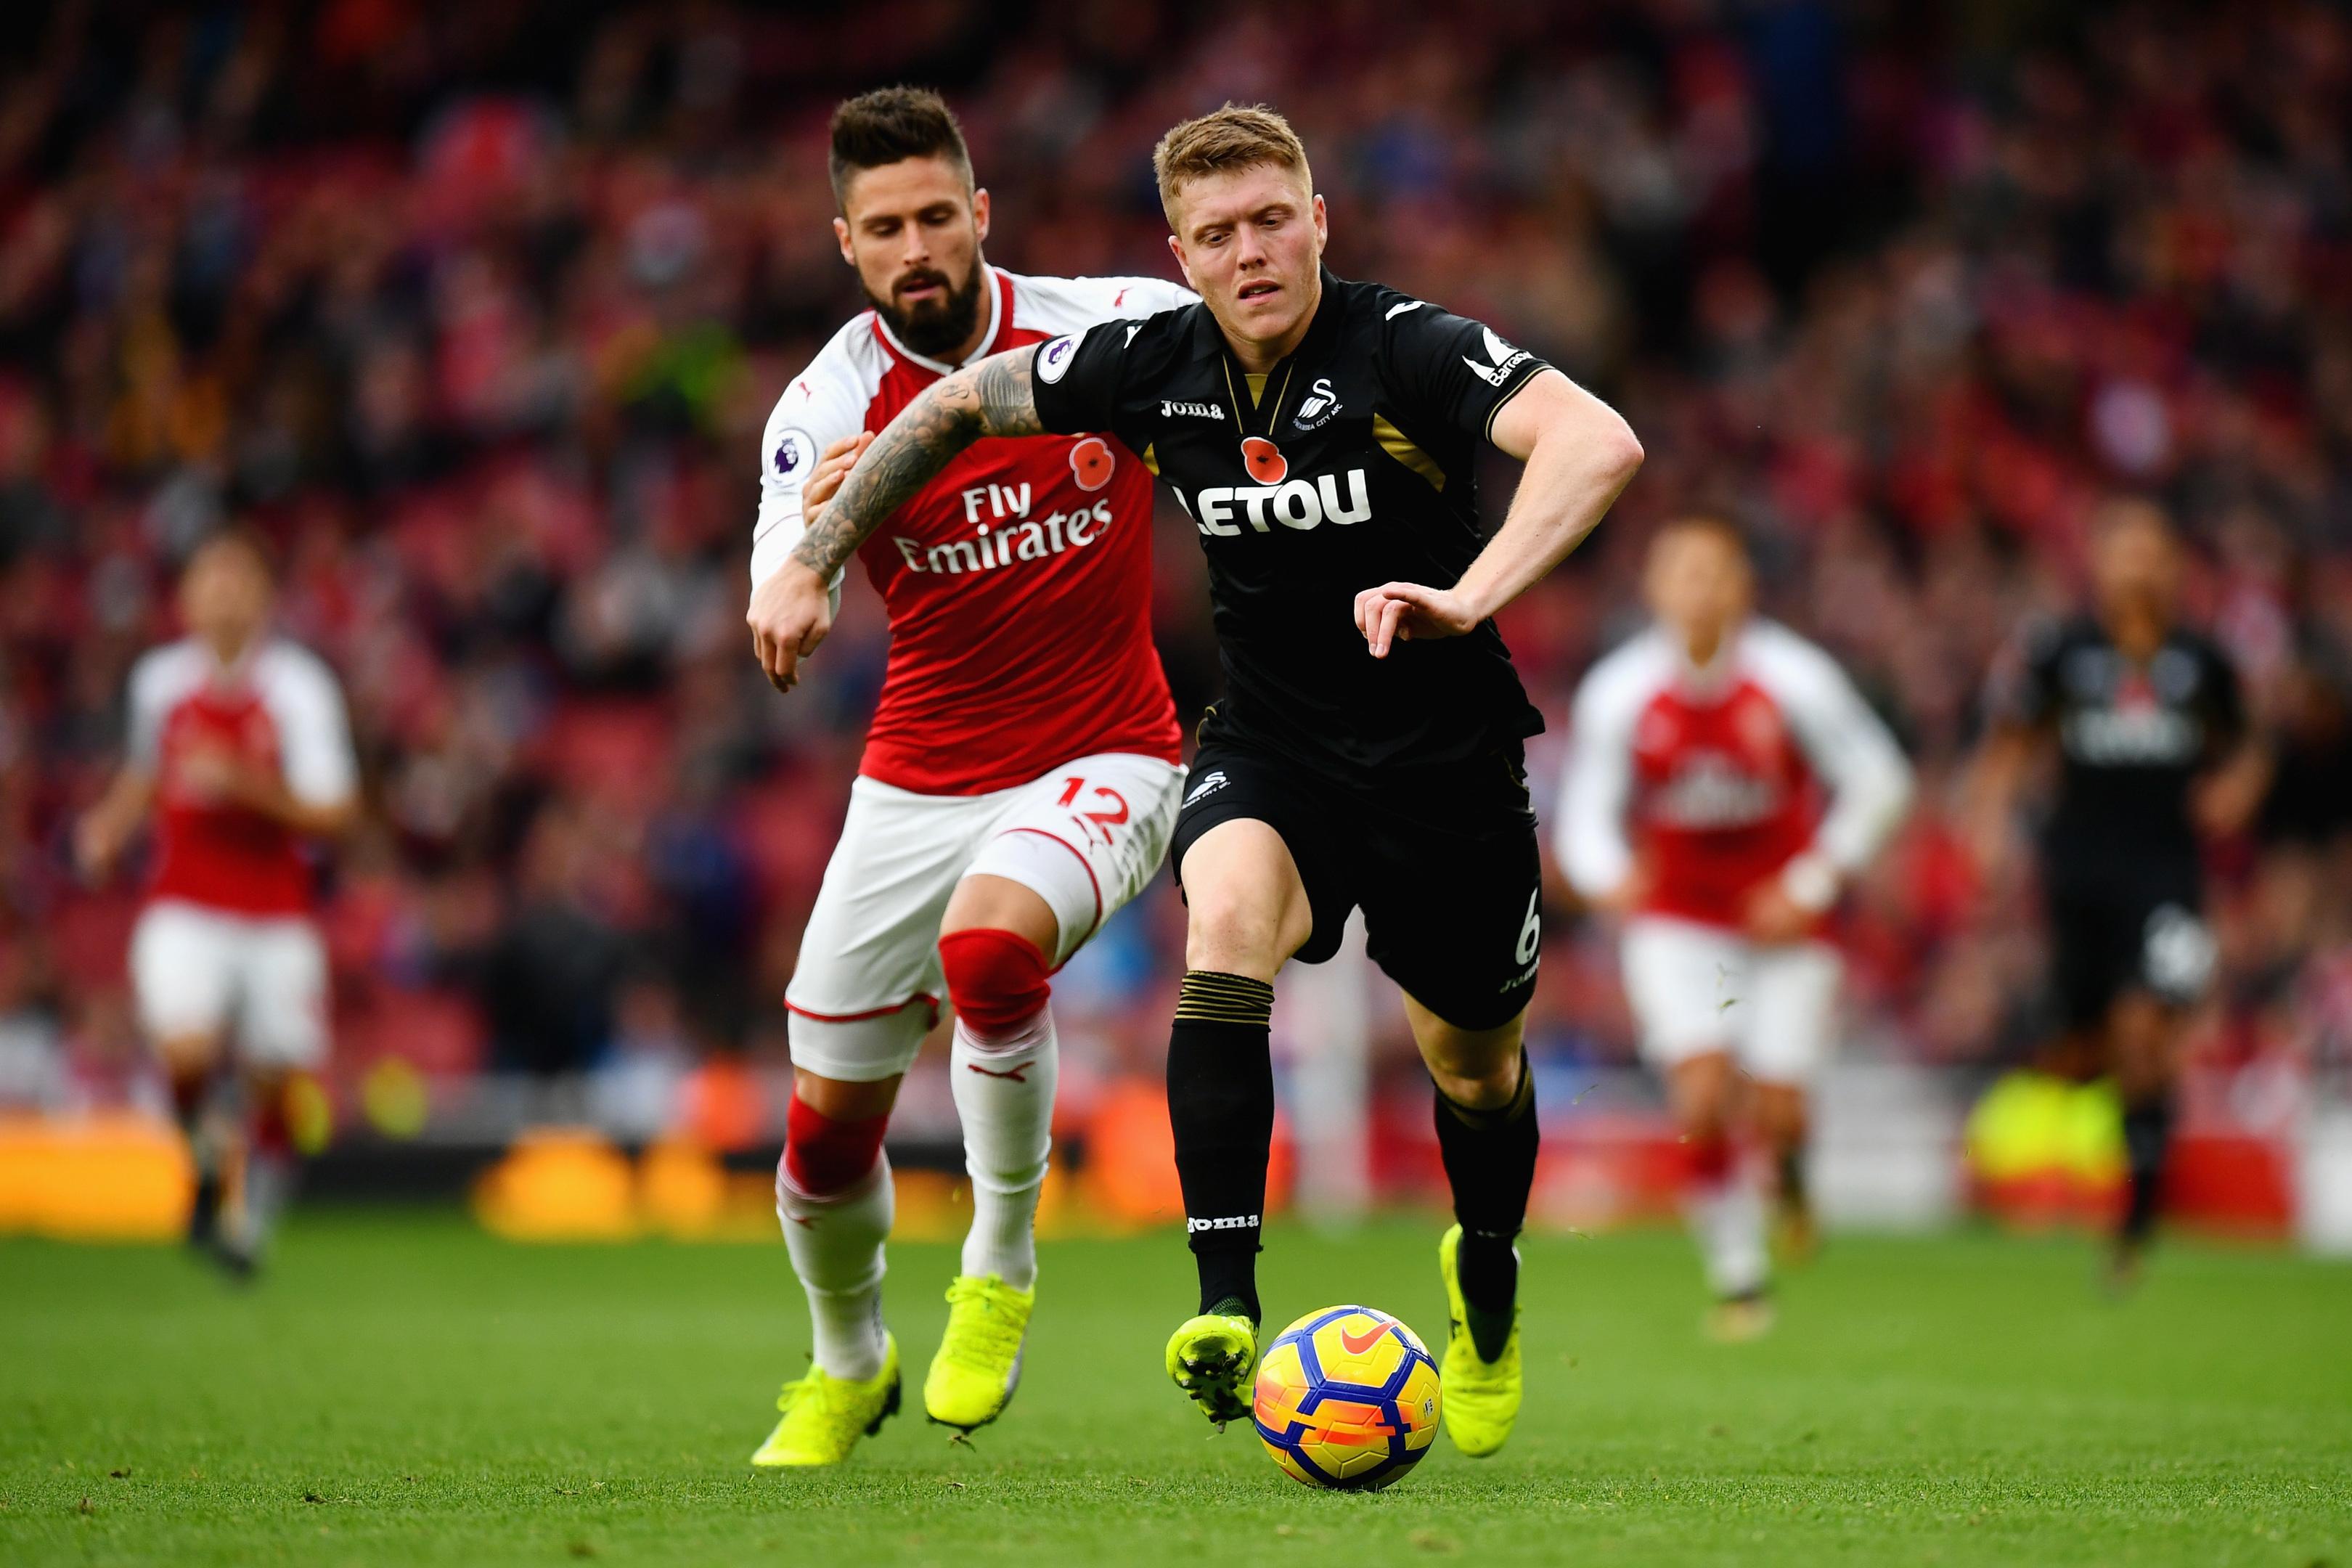 Alfie Mawson of Swansea City in action against Arsenal  (Dan Mullan/Getty Images)